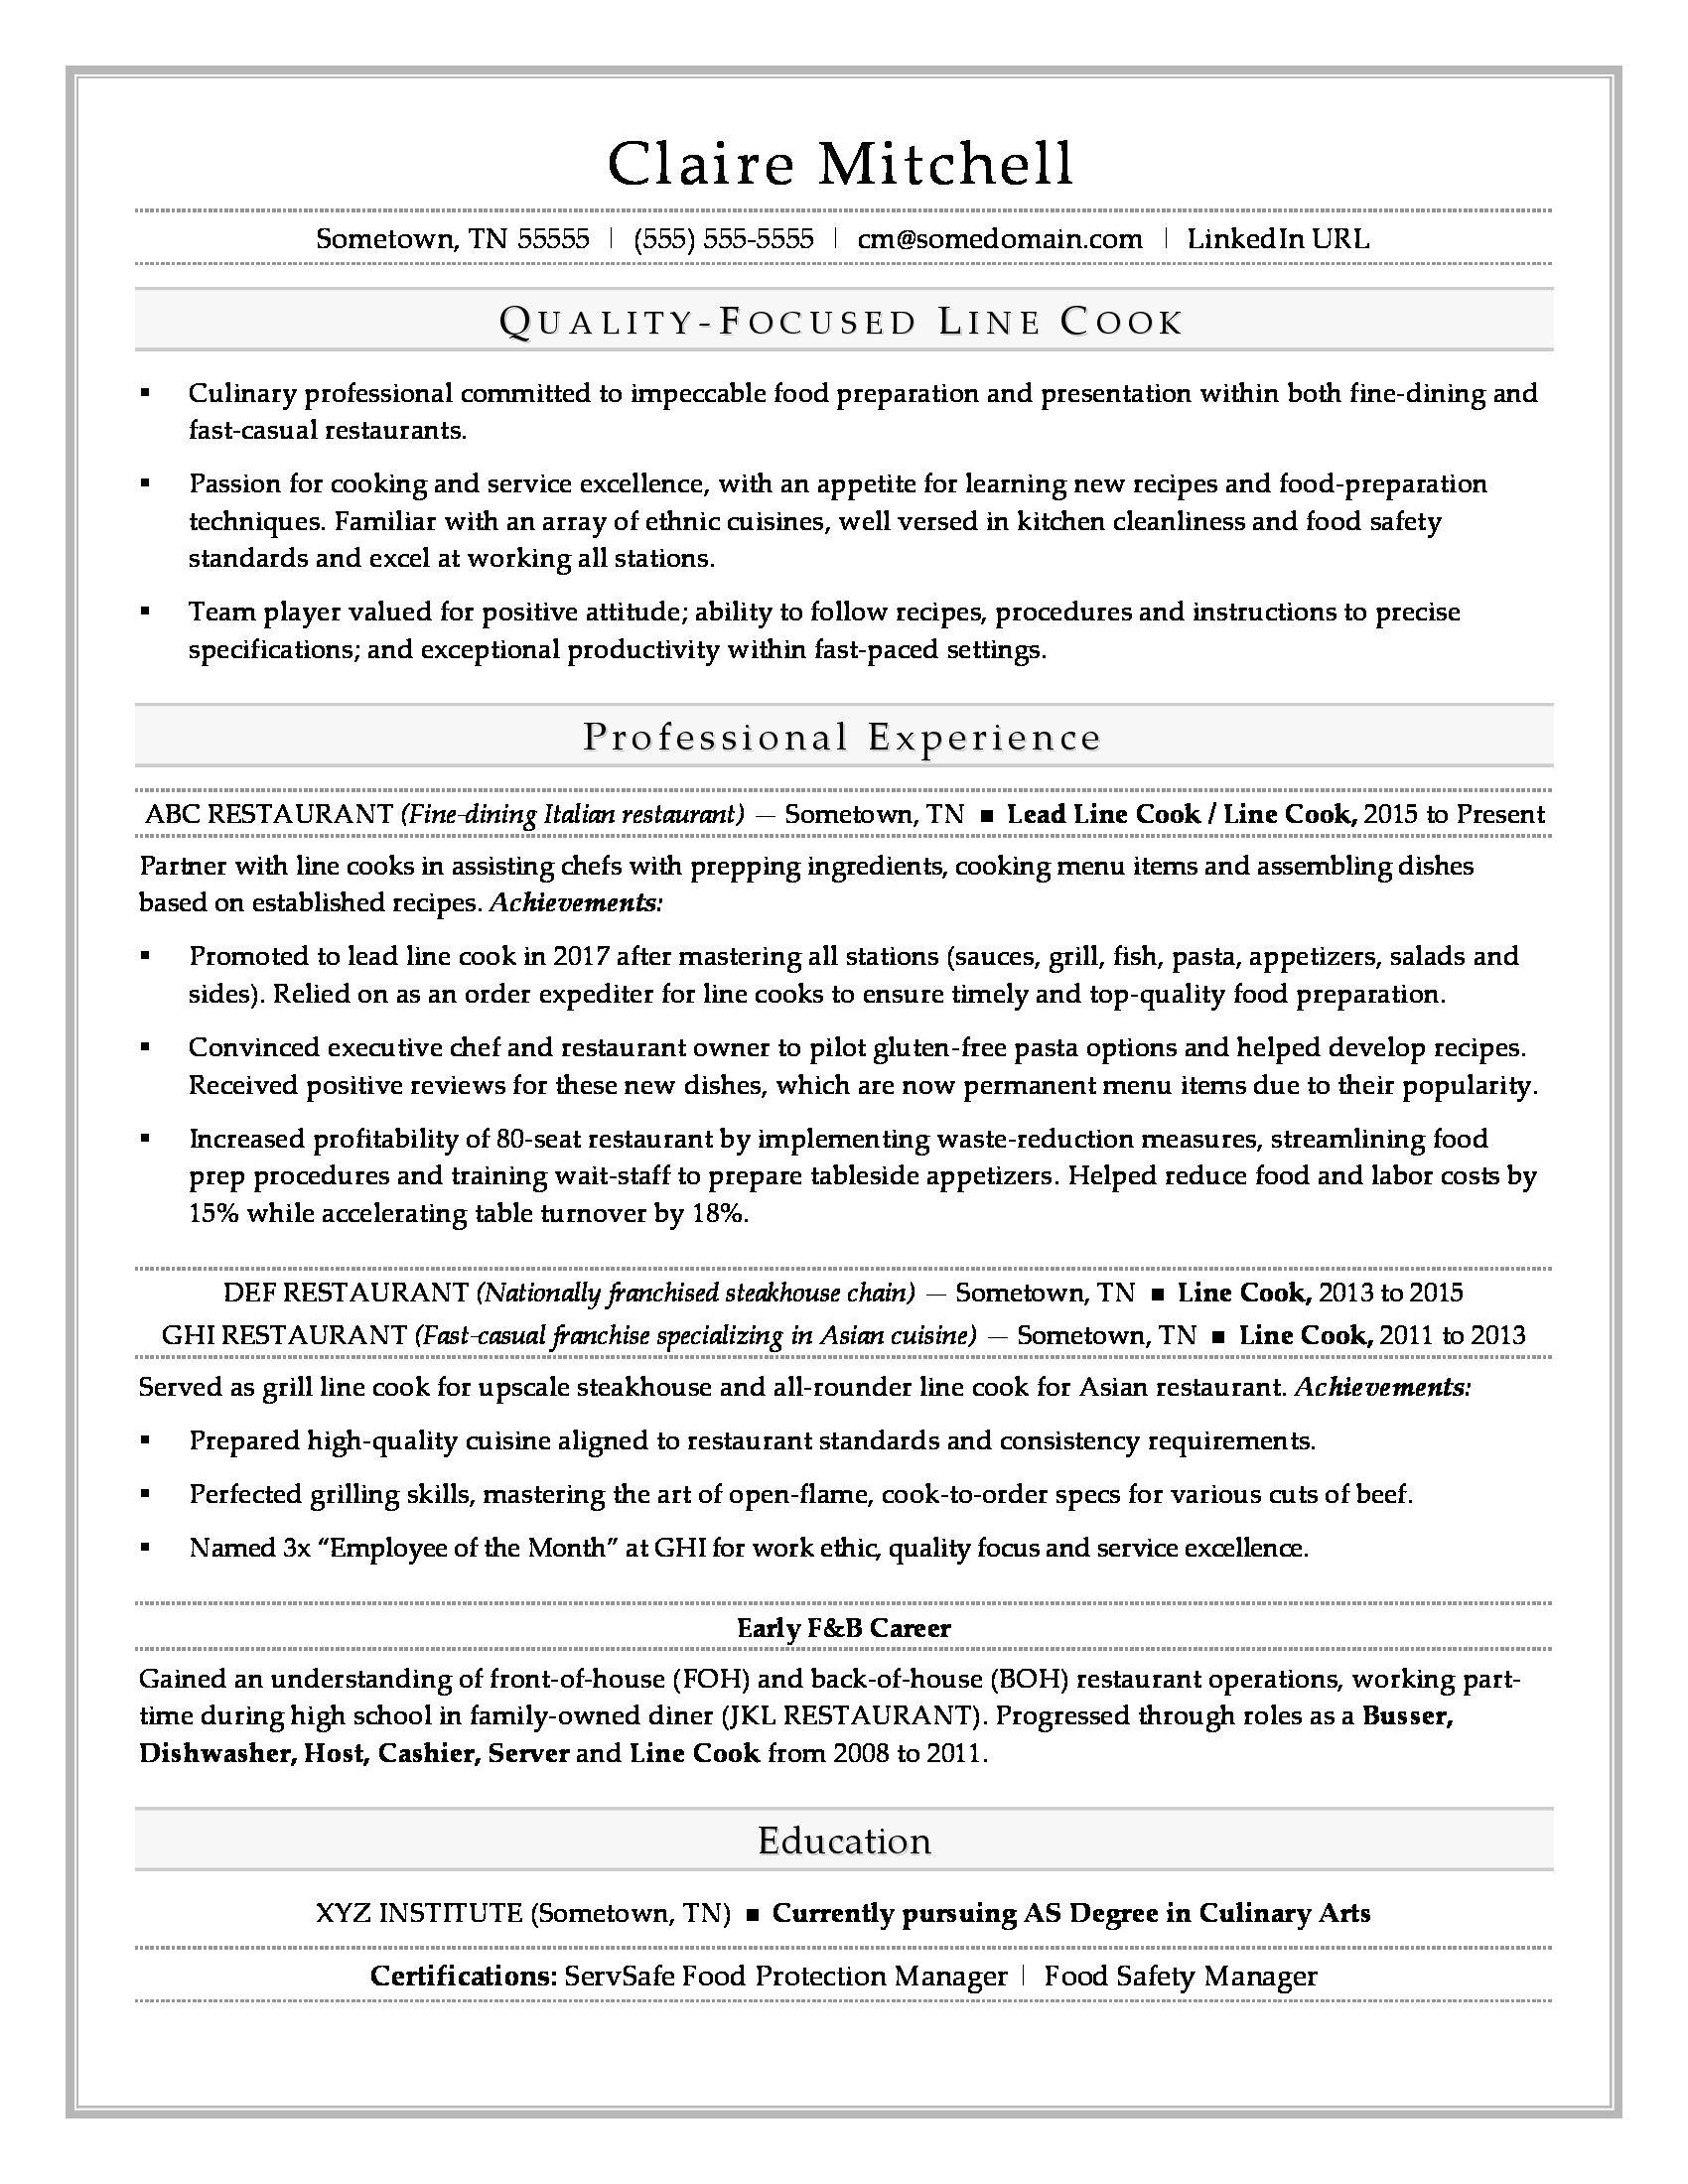 Resume Templates for Cooks Line Cook Resume Sample Monster Com